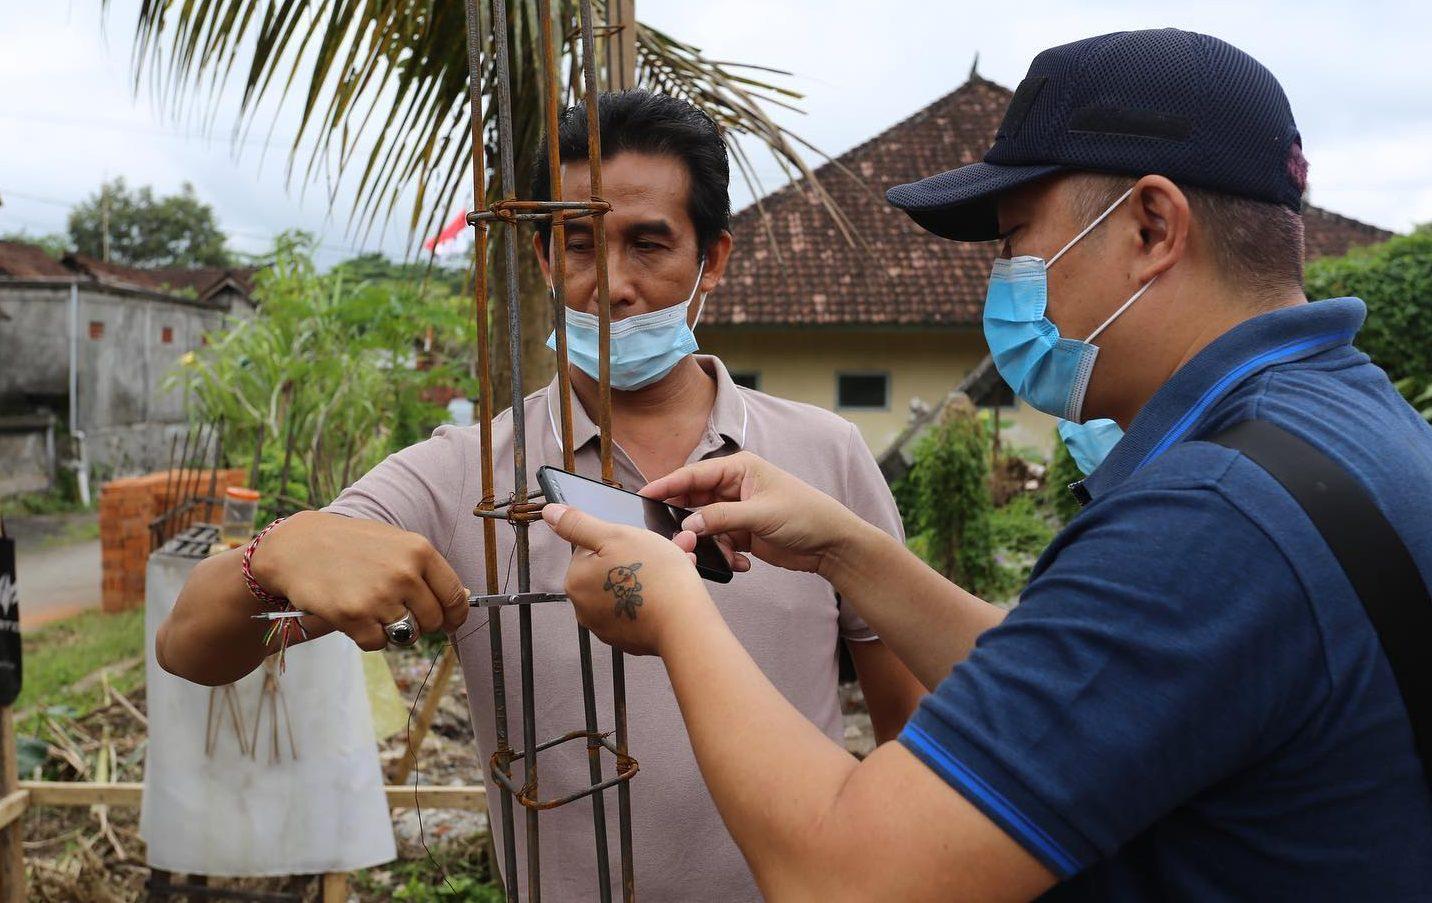 ANGGOTA Komisi II DPRD Klungkung mengukur bahan besi yang tidak sesuai spesifikasi di SDN 3 Nyalian, Kecamatan Banjarangkan. Foto: ist